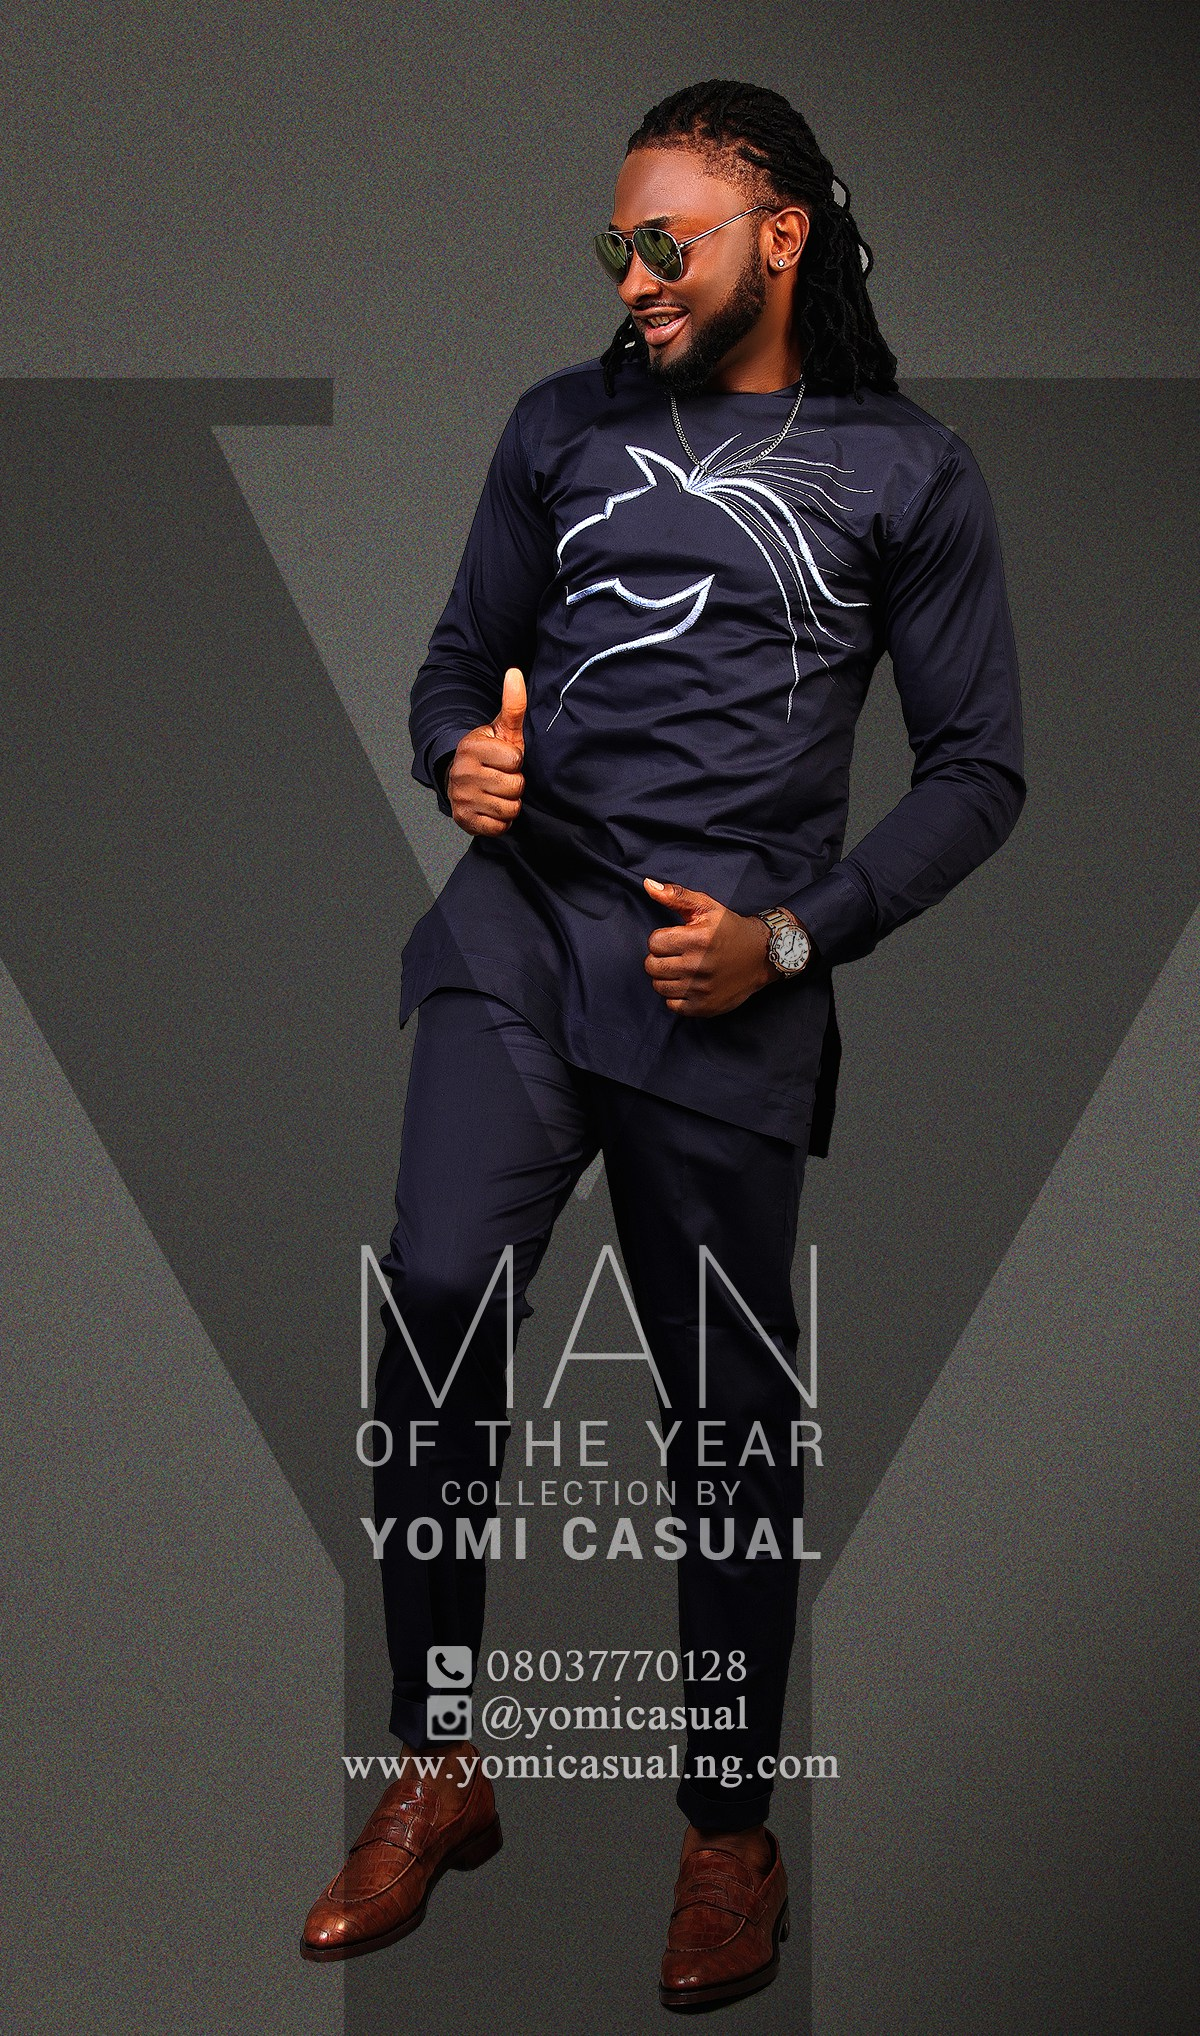 manly.ng Yomi Casual Man of the Year (6)